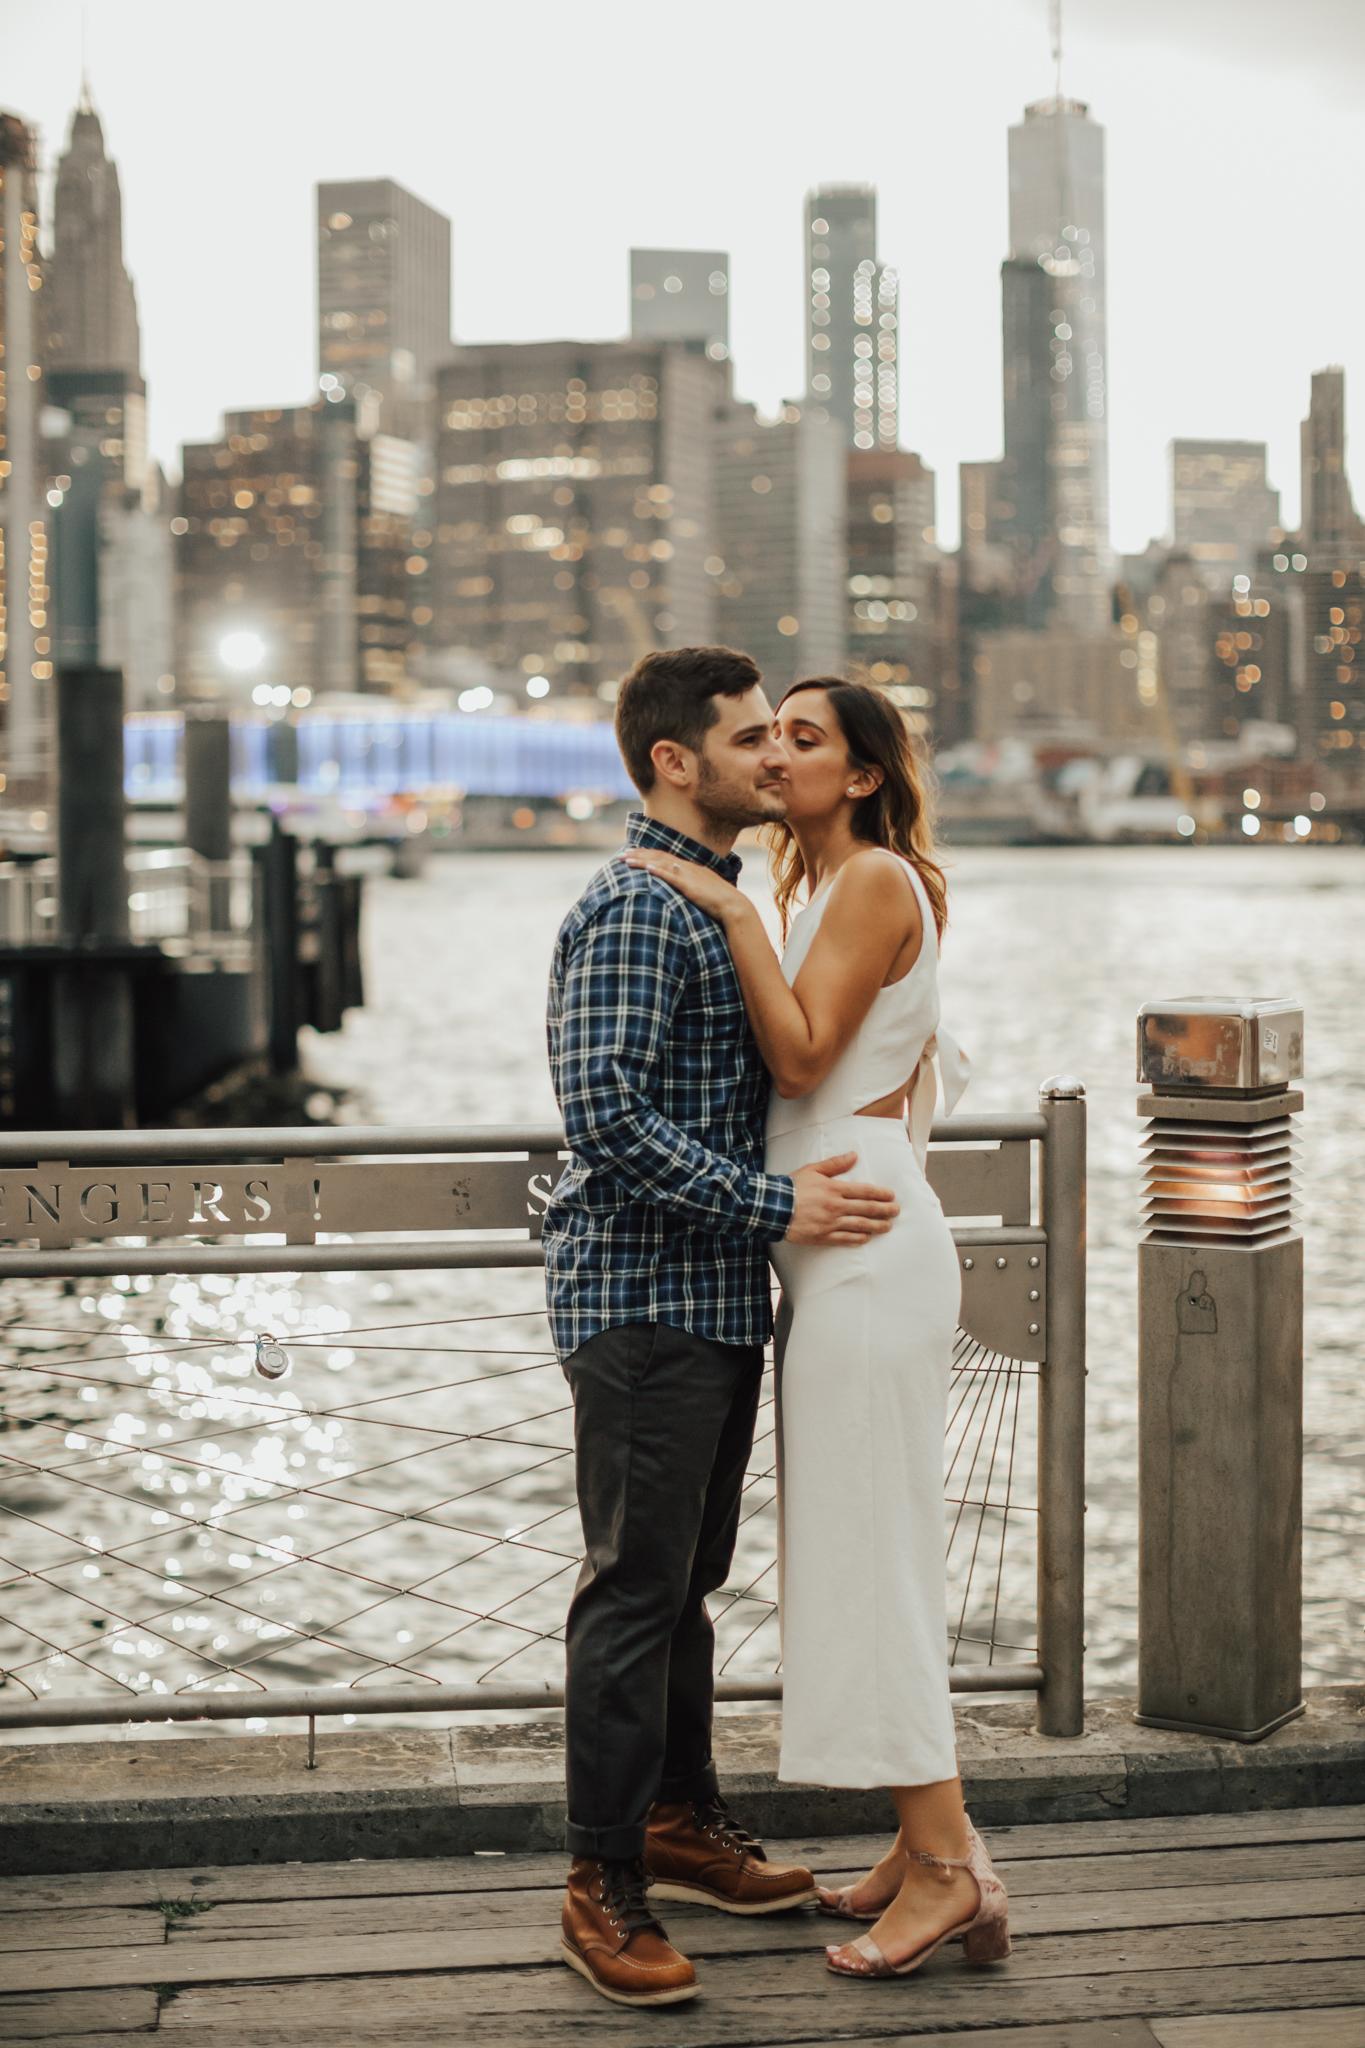 Hipster wedding photography New York